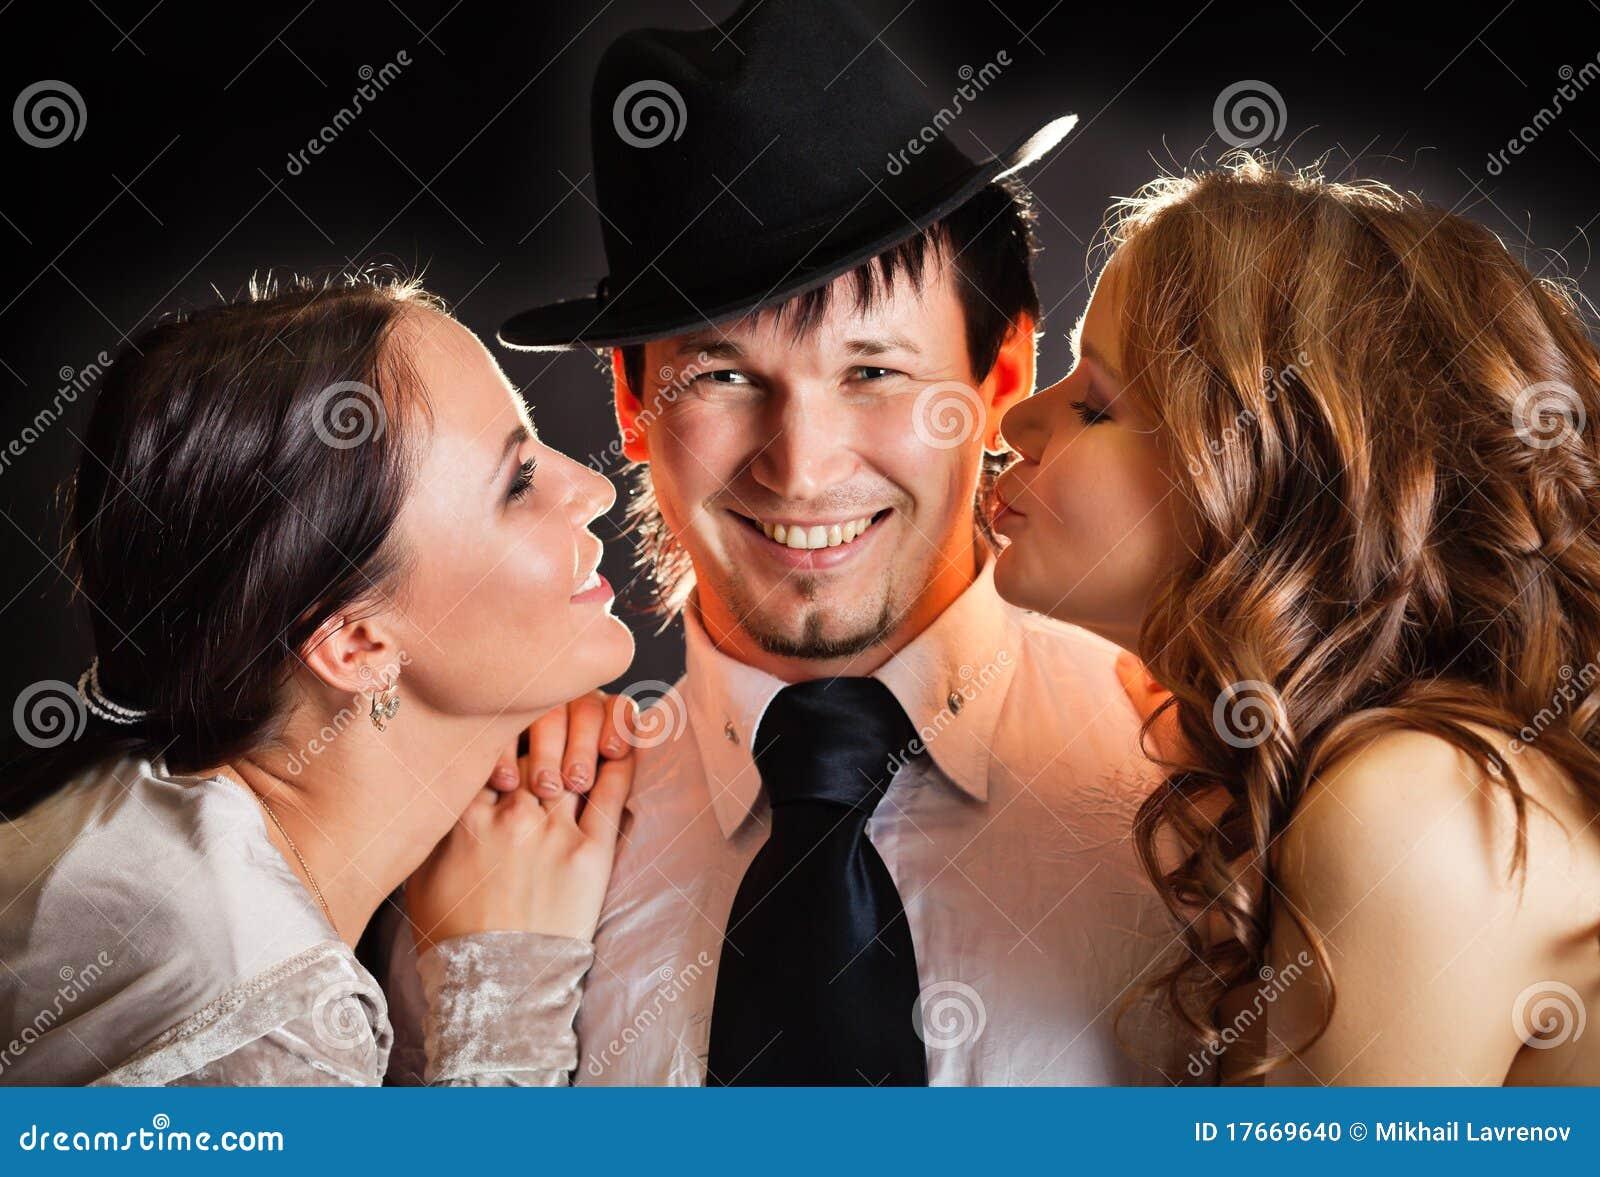 Share hot threesome 2 girls one guy